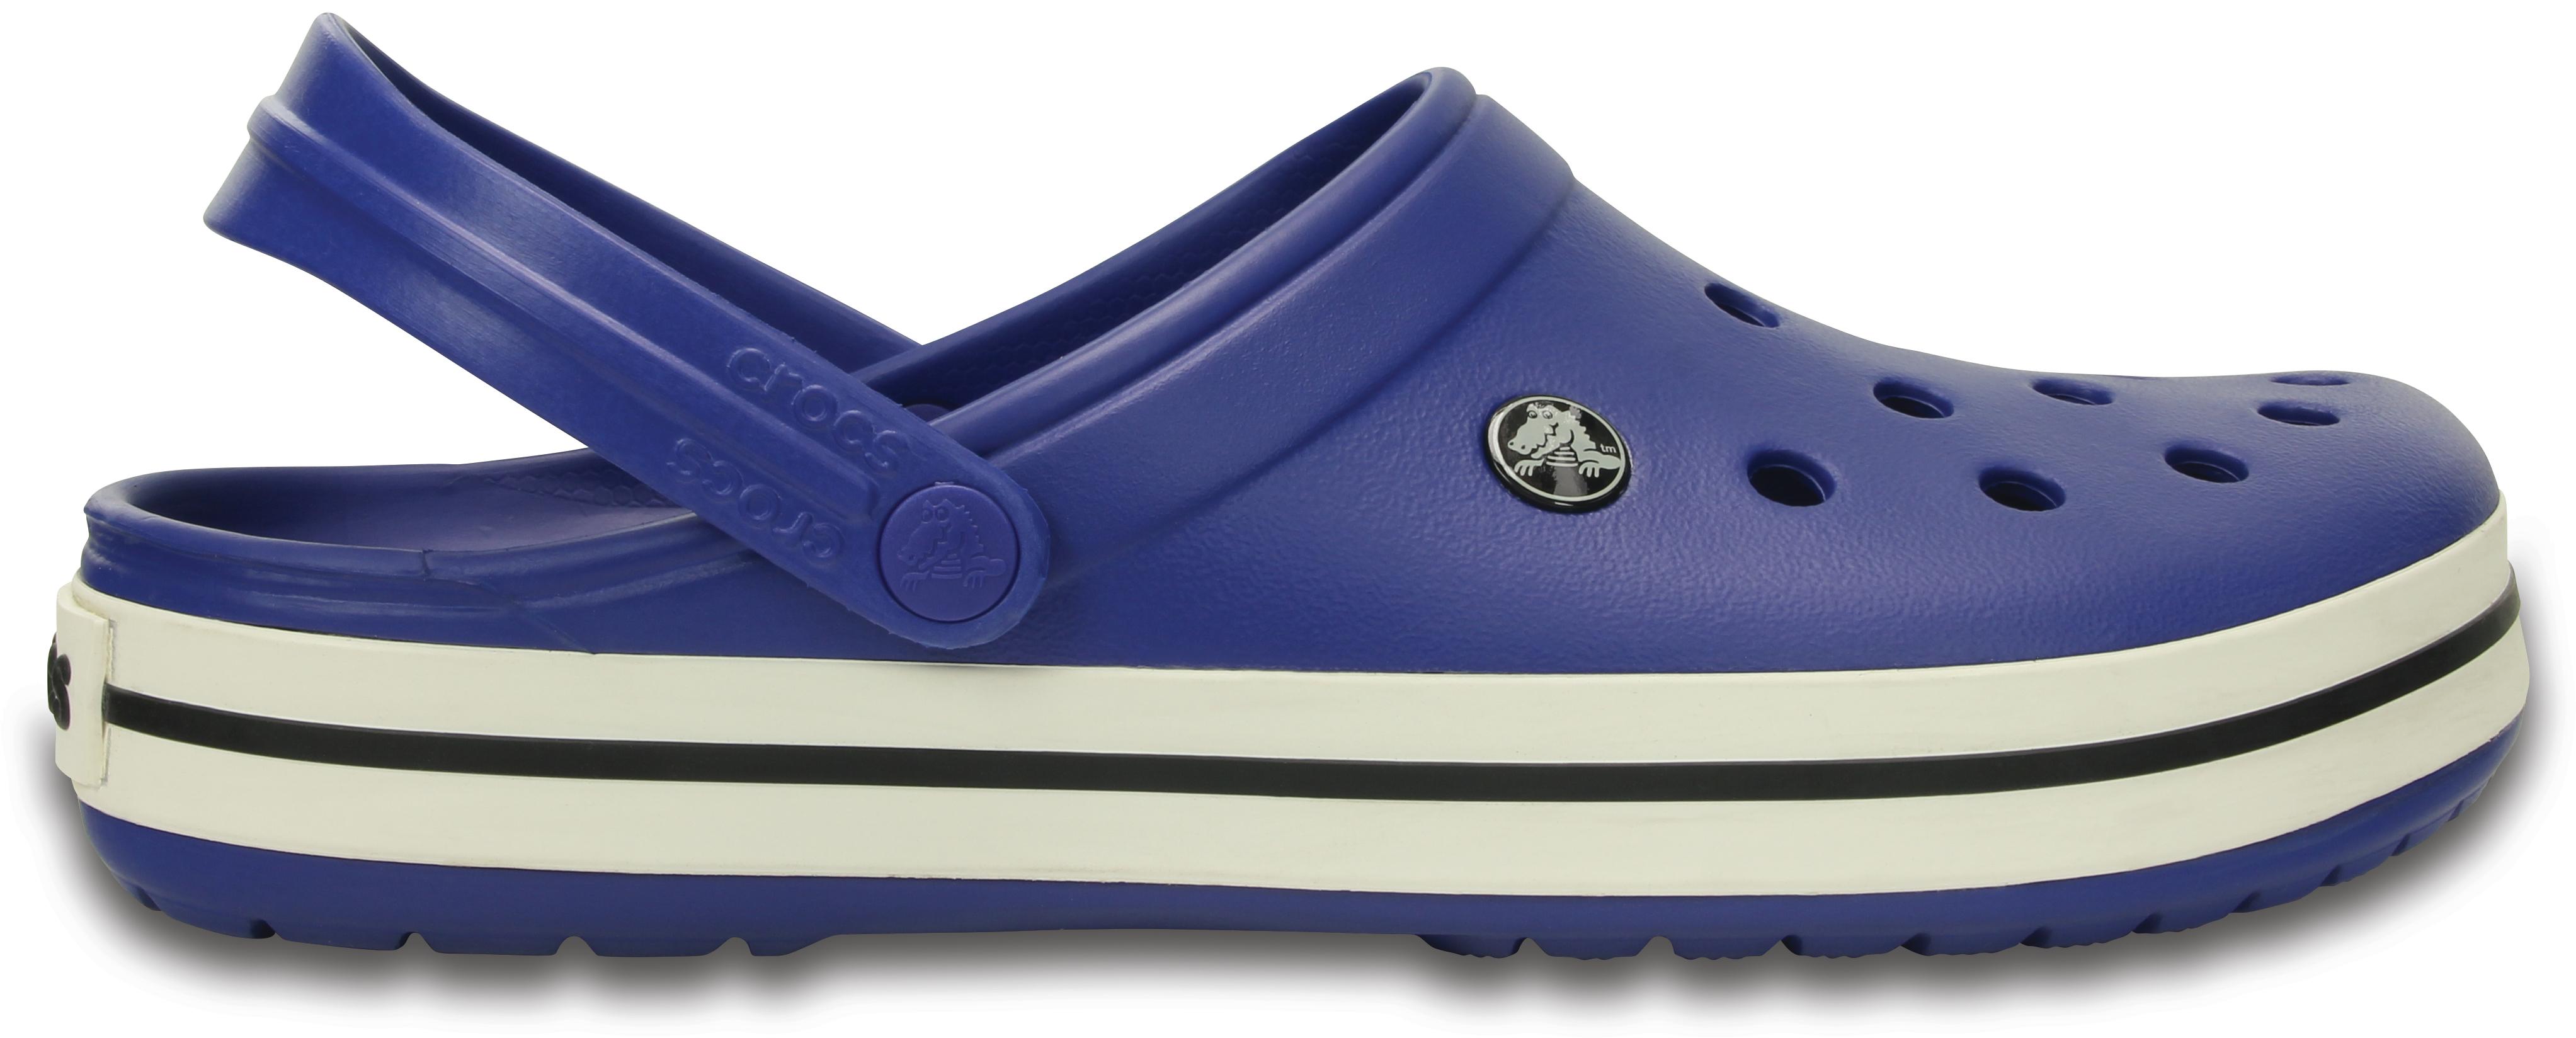 Crocs Crocband - Cerulean Blue/Oyster M5/W7